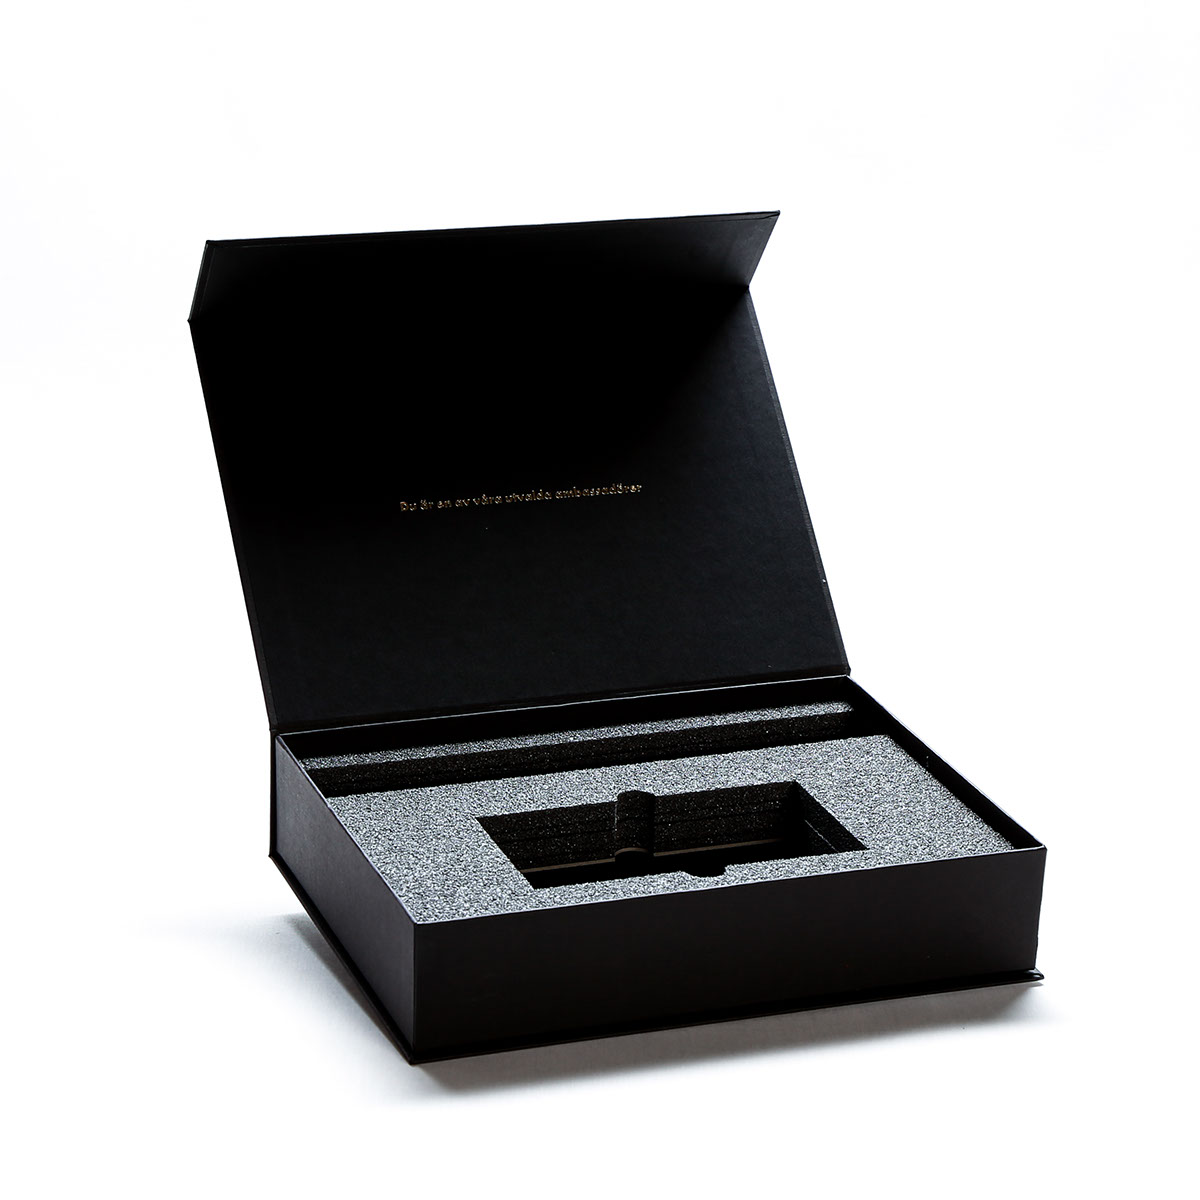 Box in binder